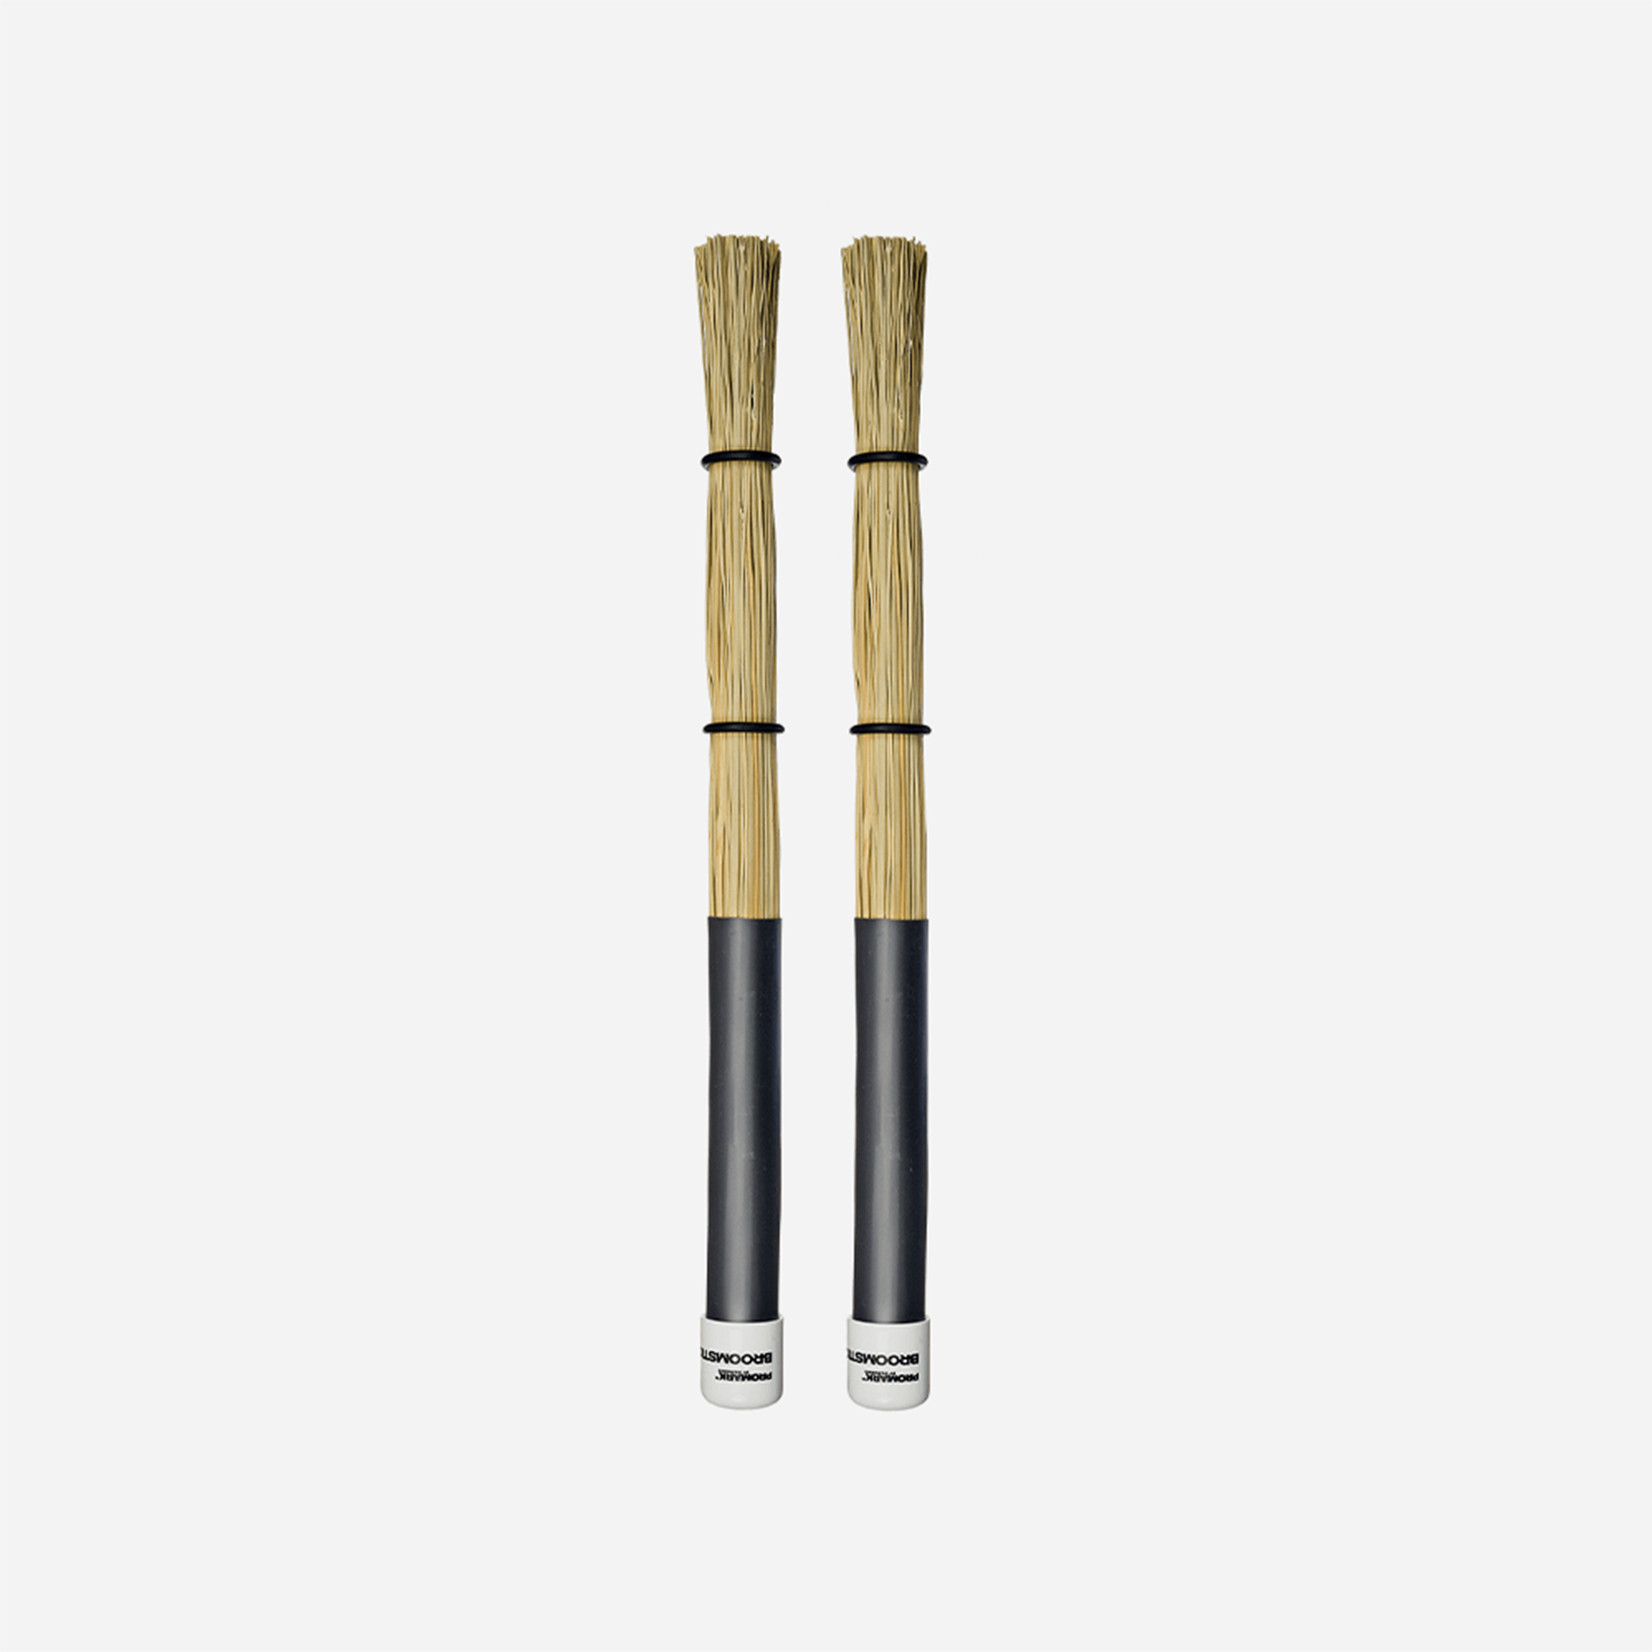 Promark Promark Medium Broomstick